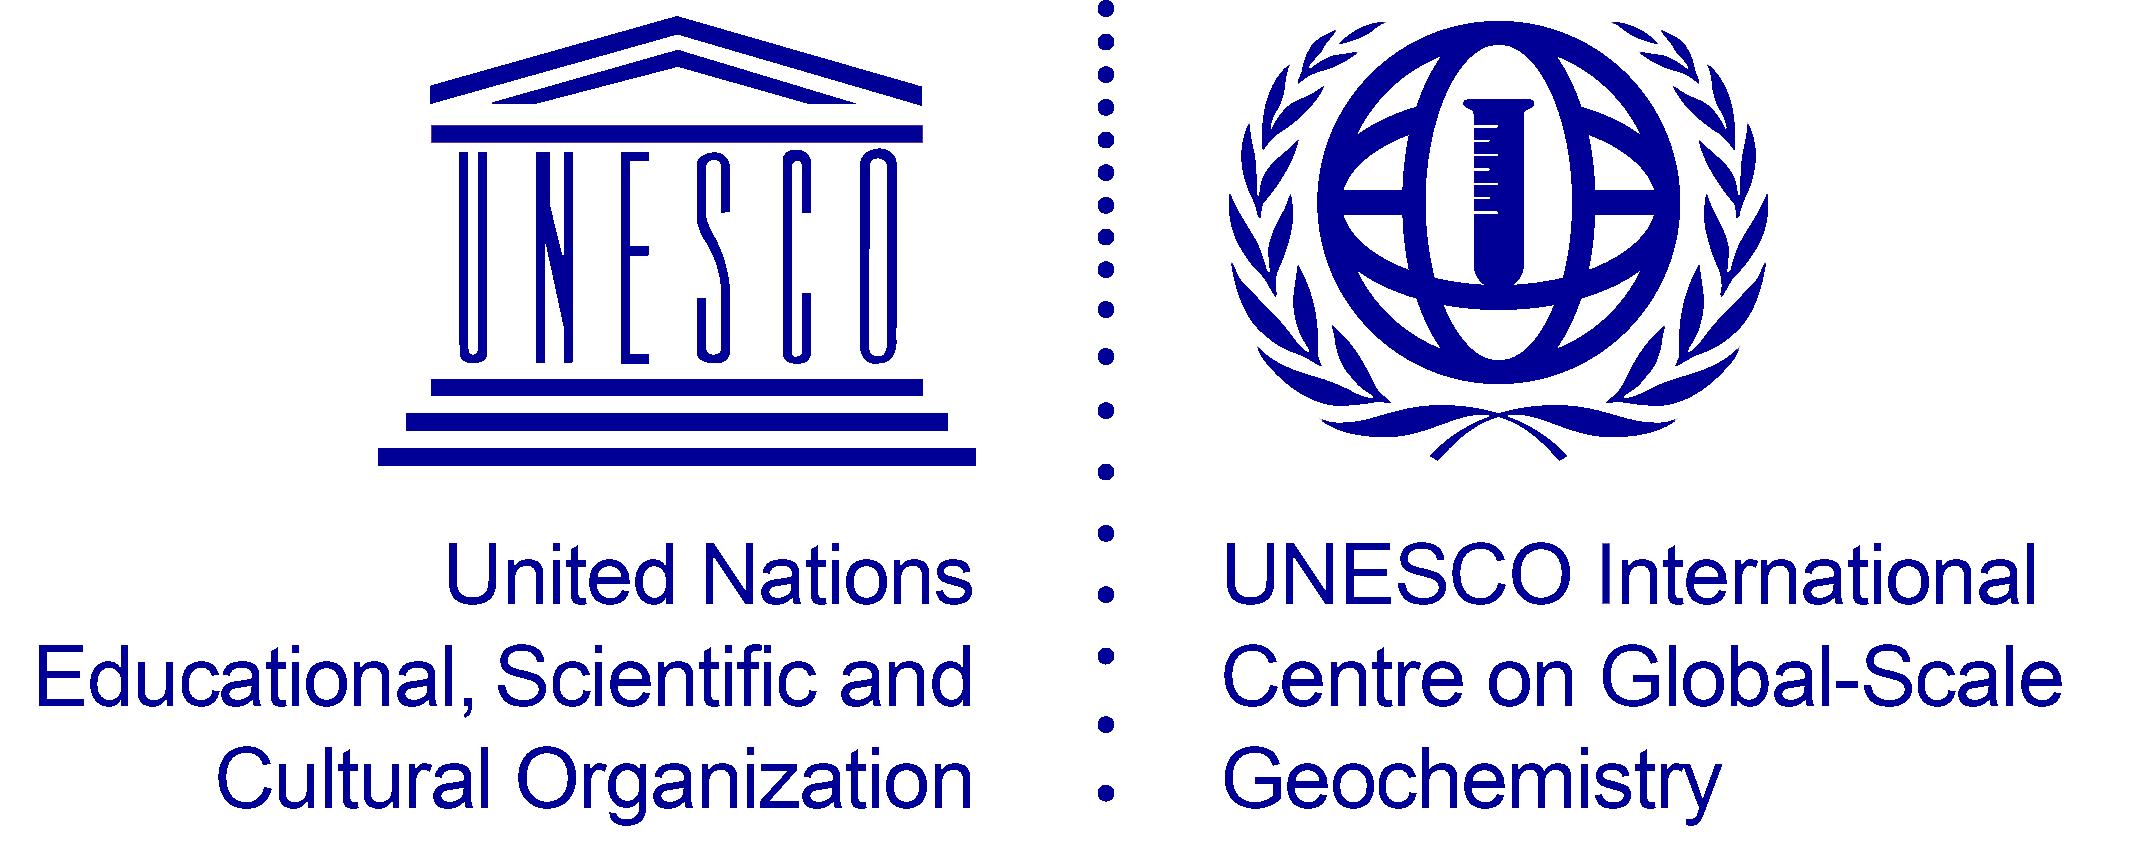 logo for International Centre on Global-Scale Geochemistry